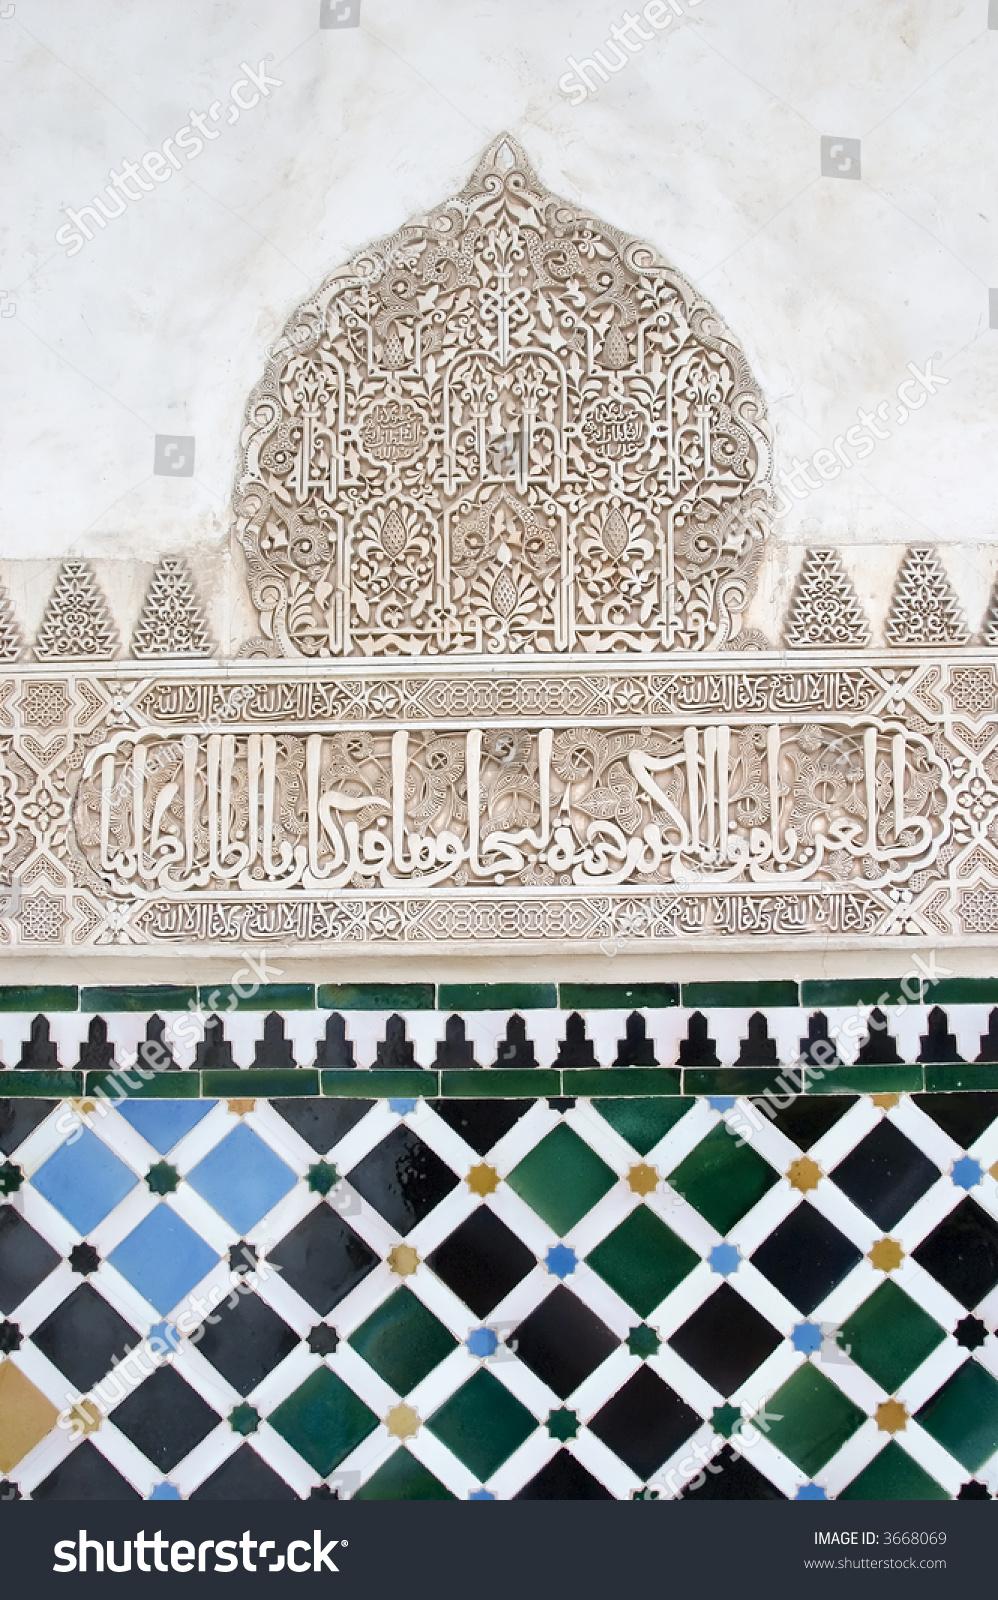 Islamic Tile Work : Detail of islamic moorish plasterwork and tile work at